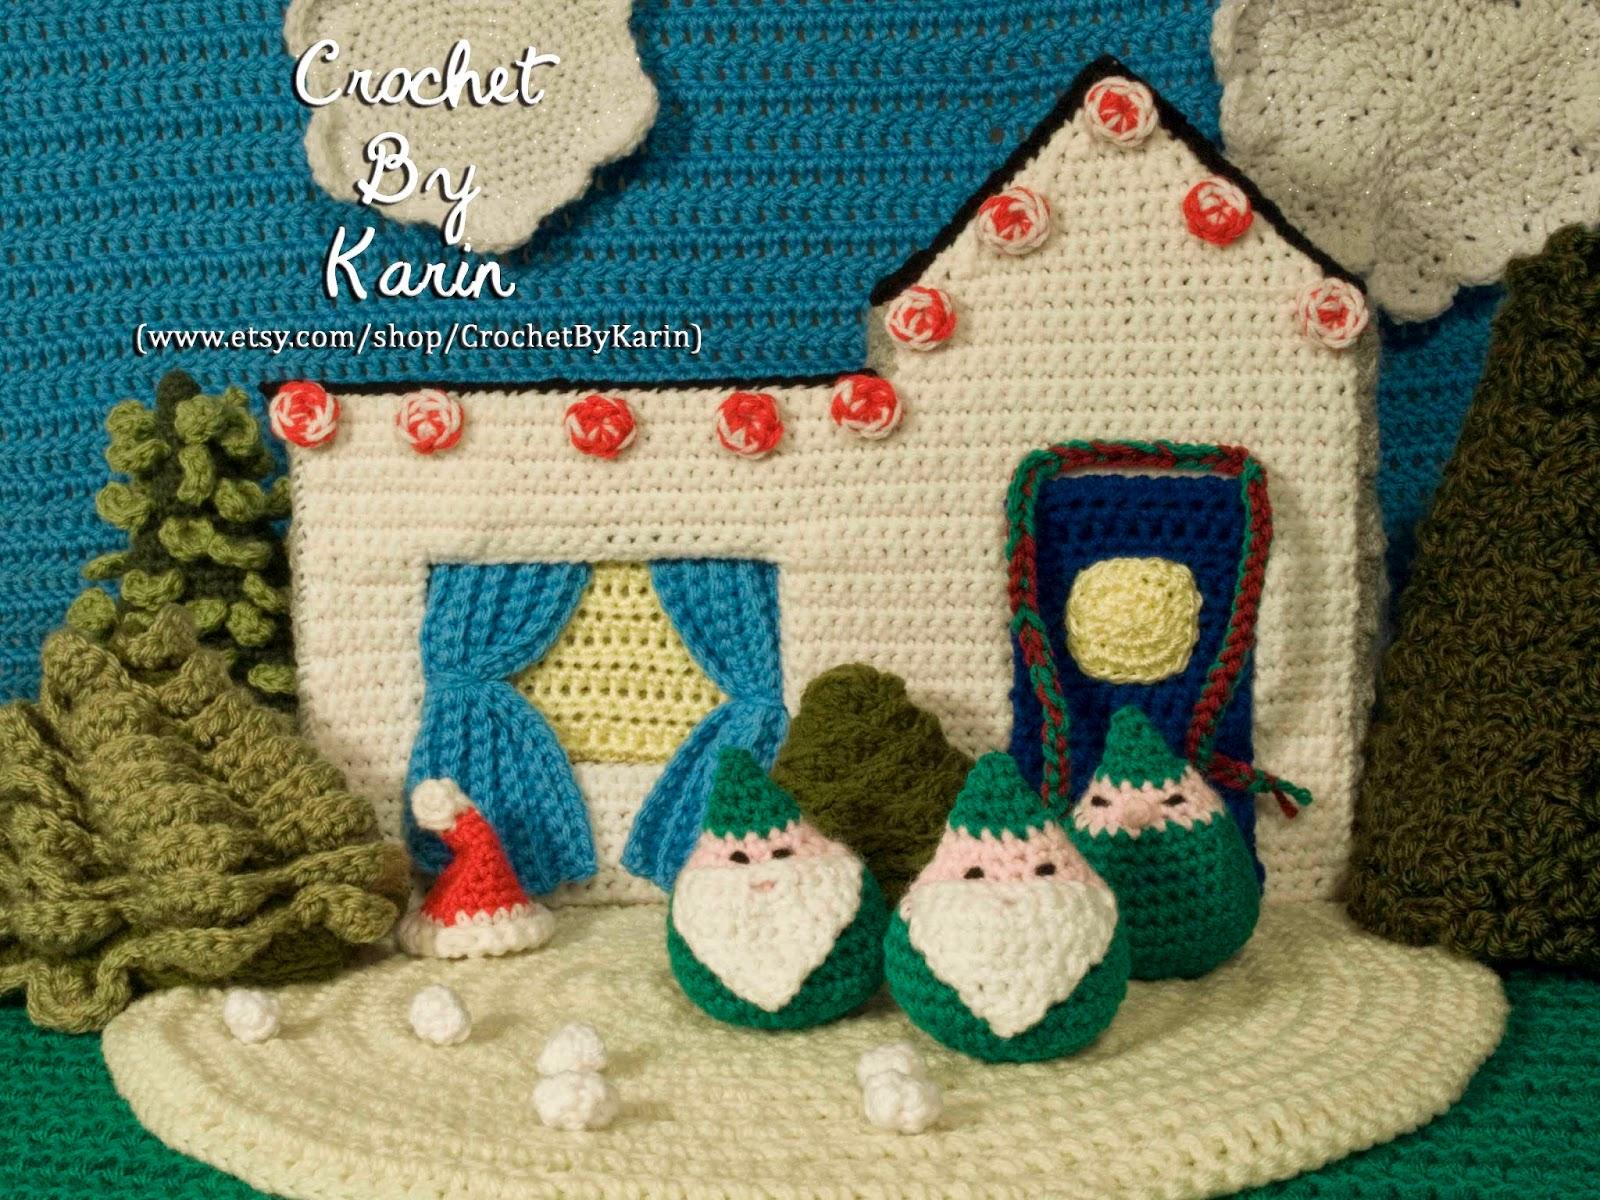 CrochetByKarin: Crochet Christmas Gnomes Smell Like Cookies